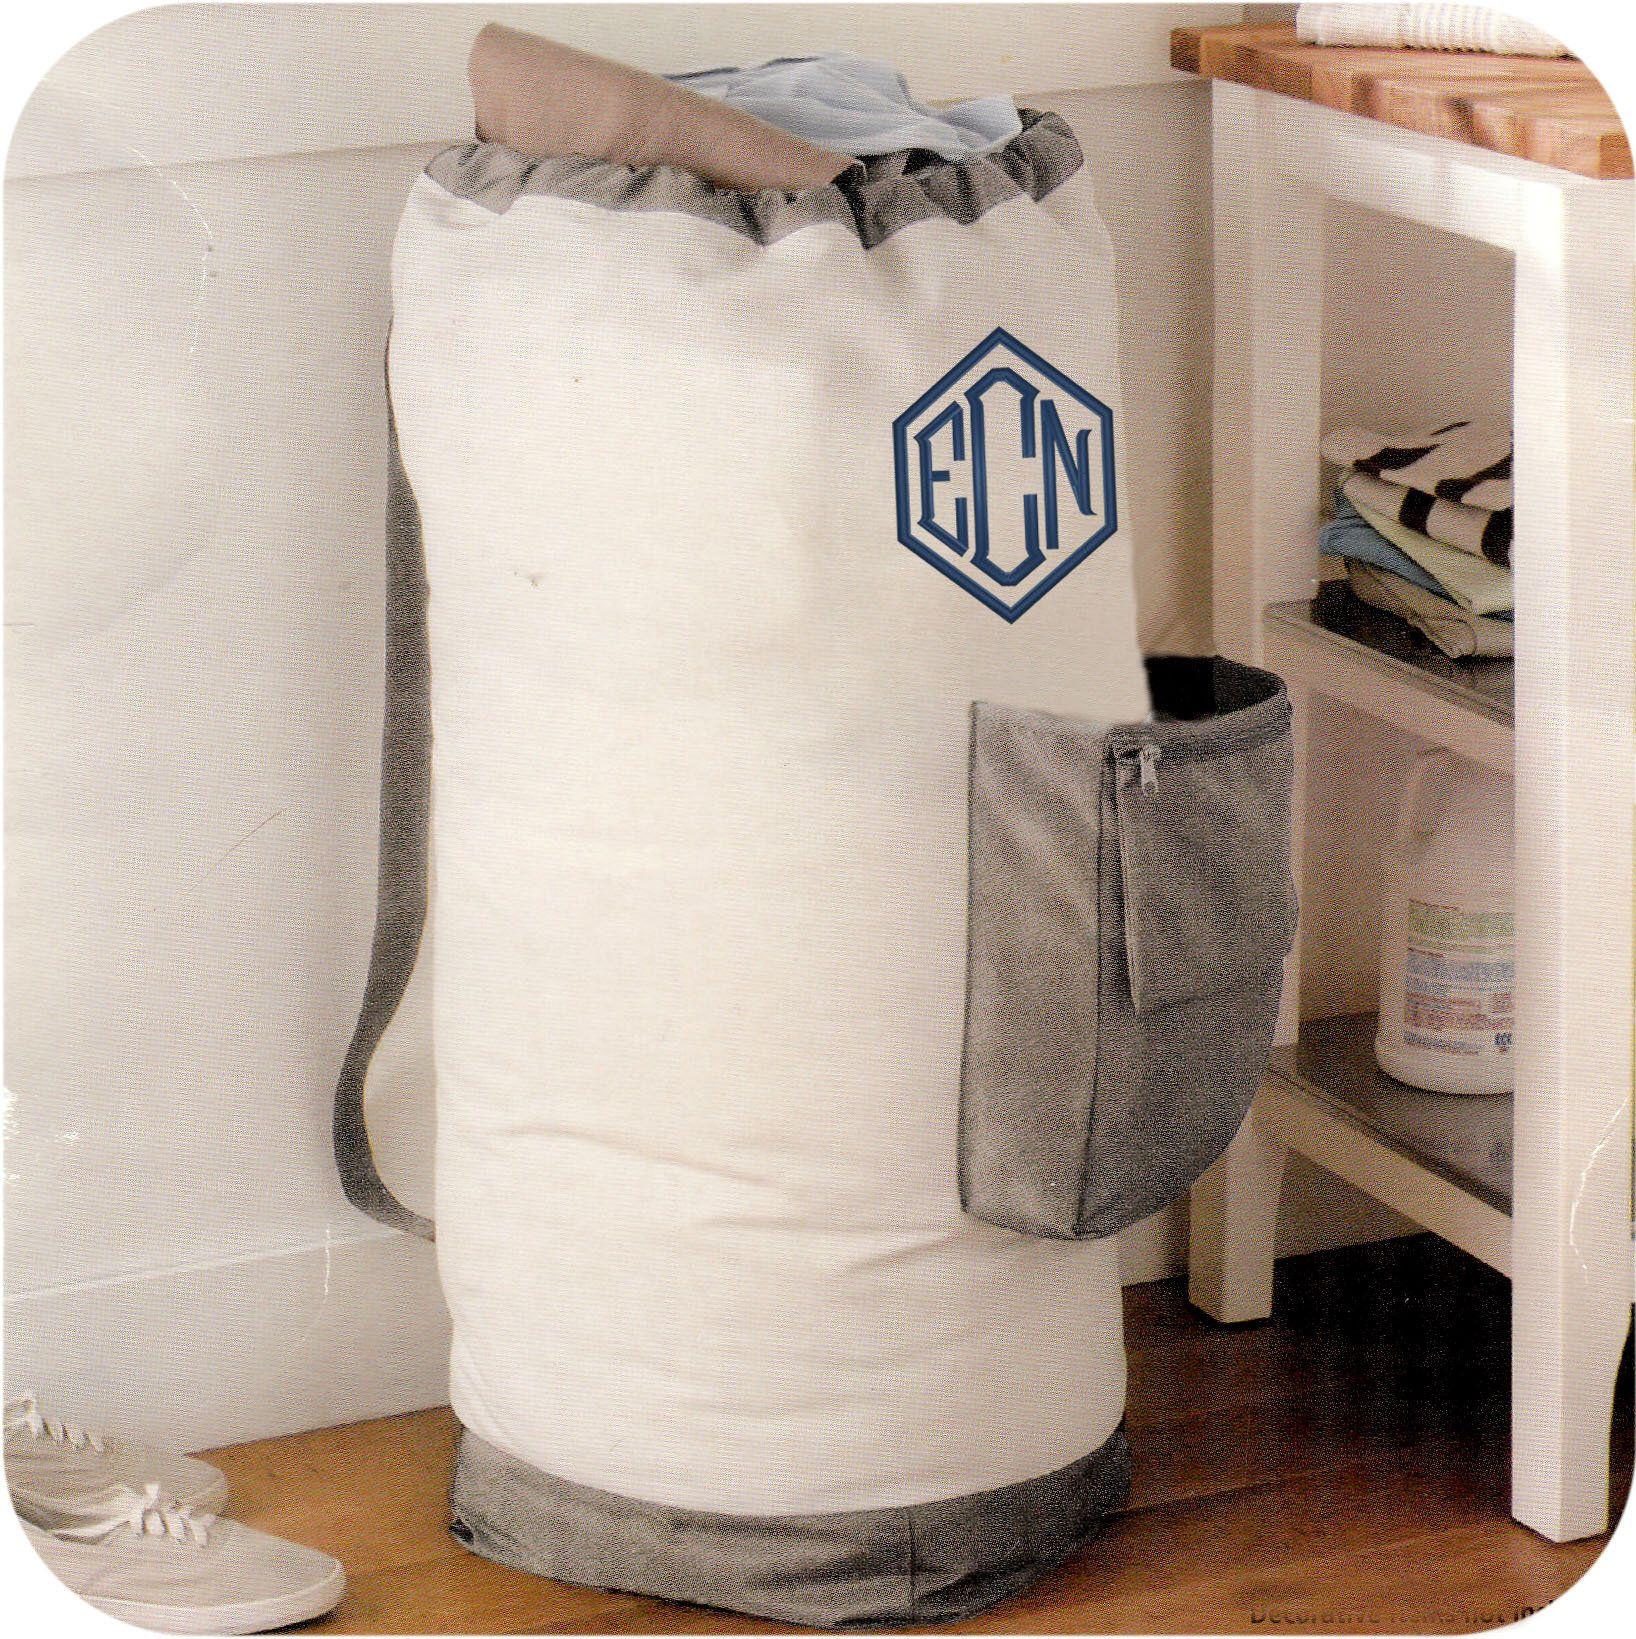 Monogrammed Laundry Bag Etsy Senior Gifts Monogrammed Laundry